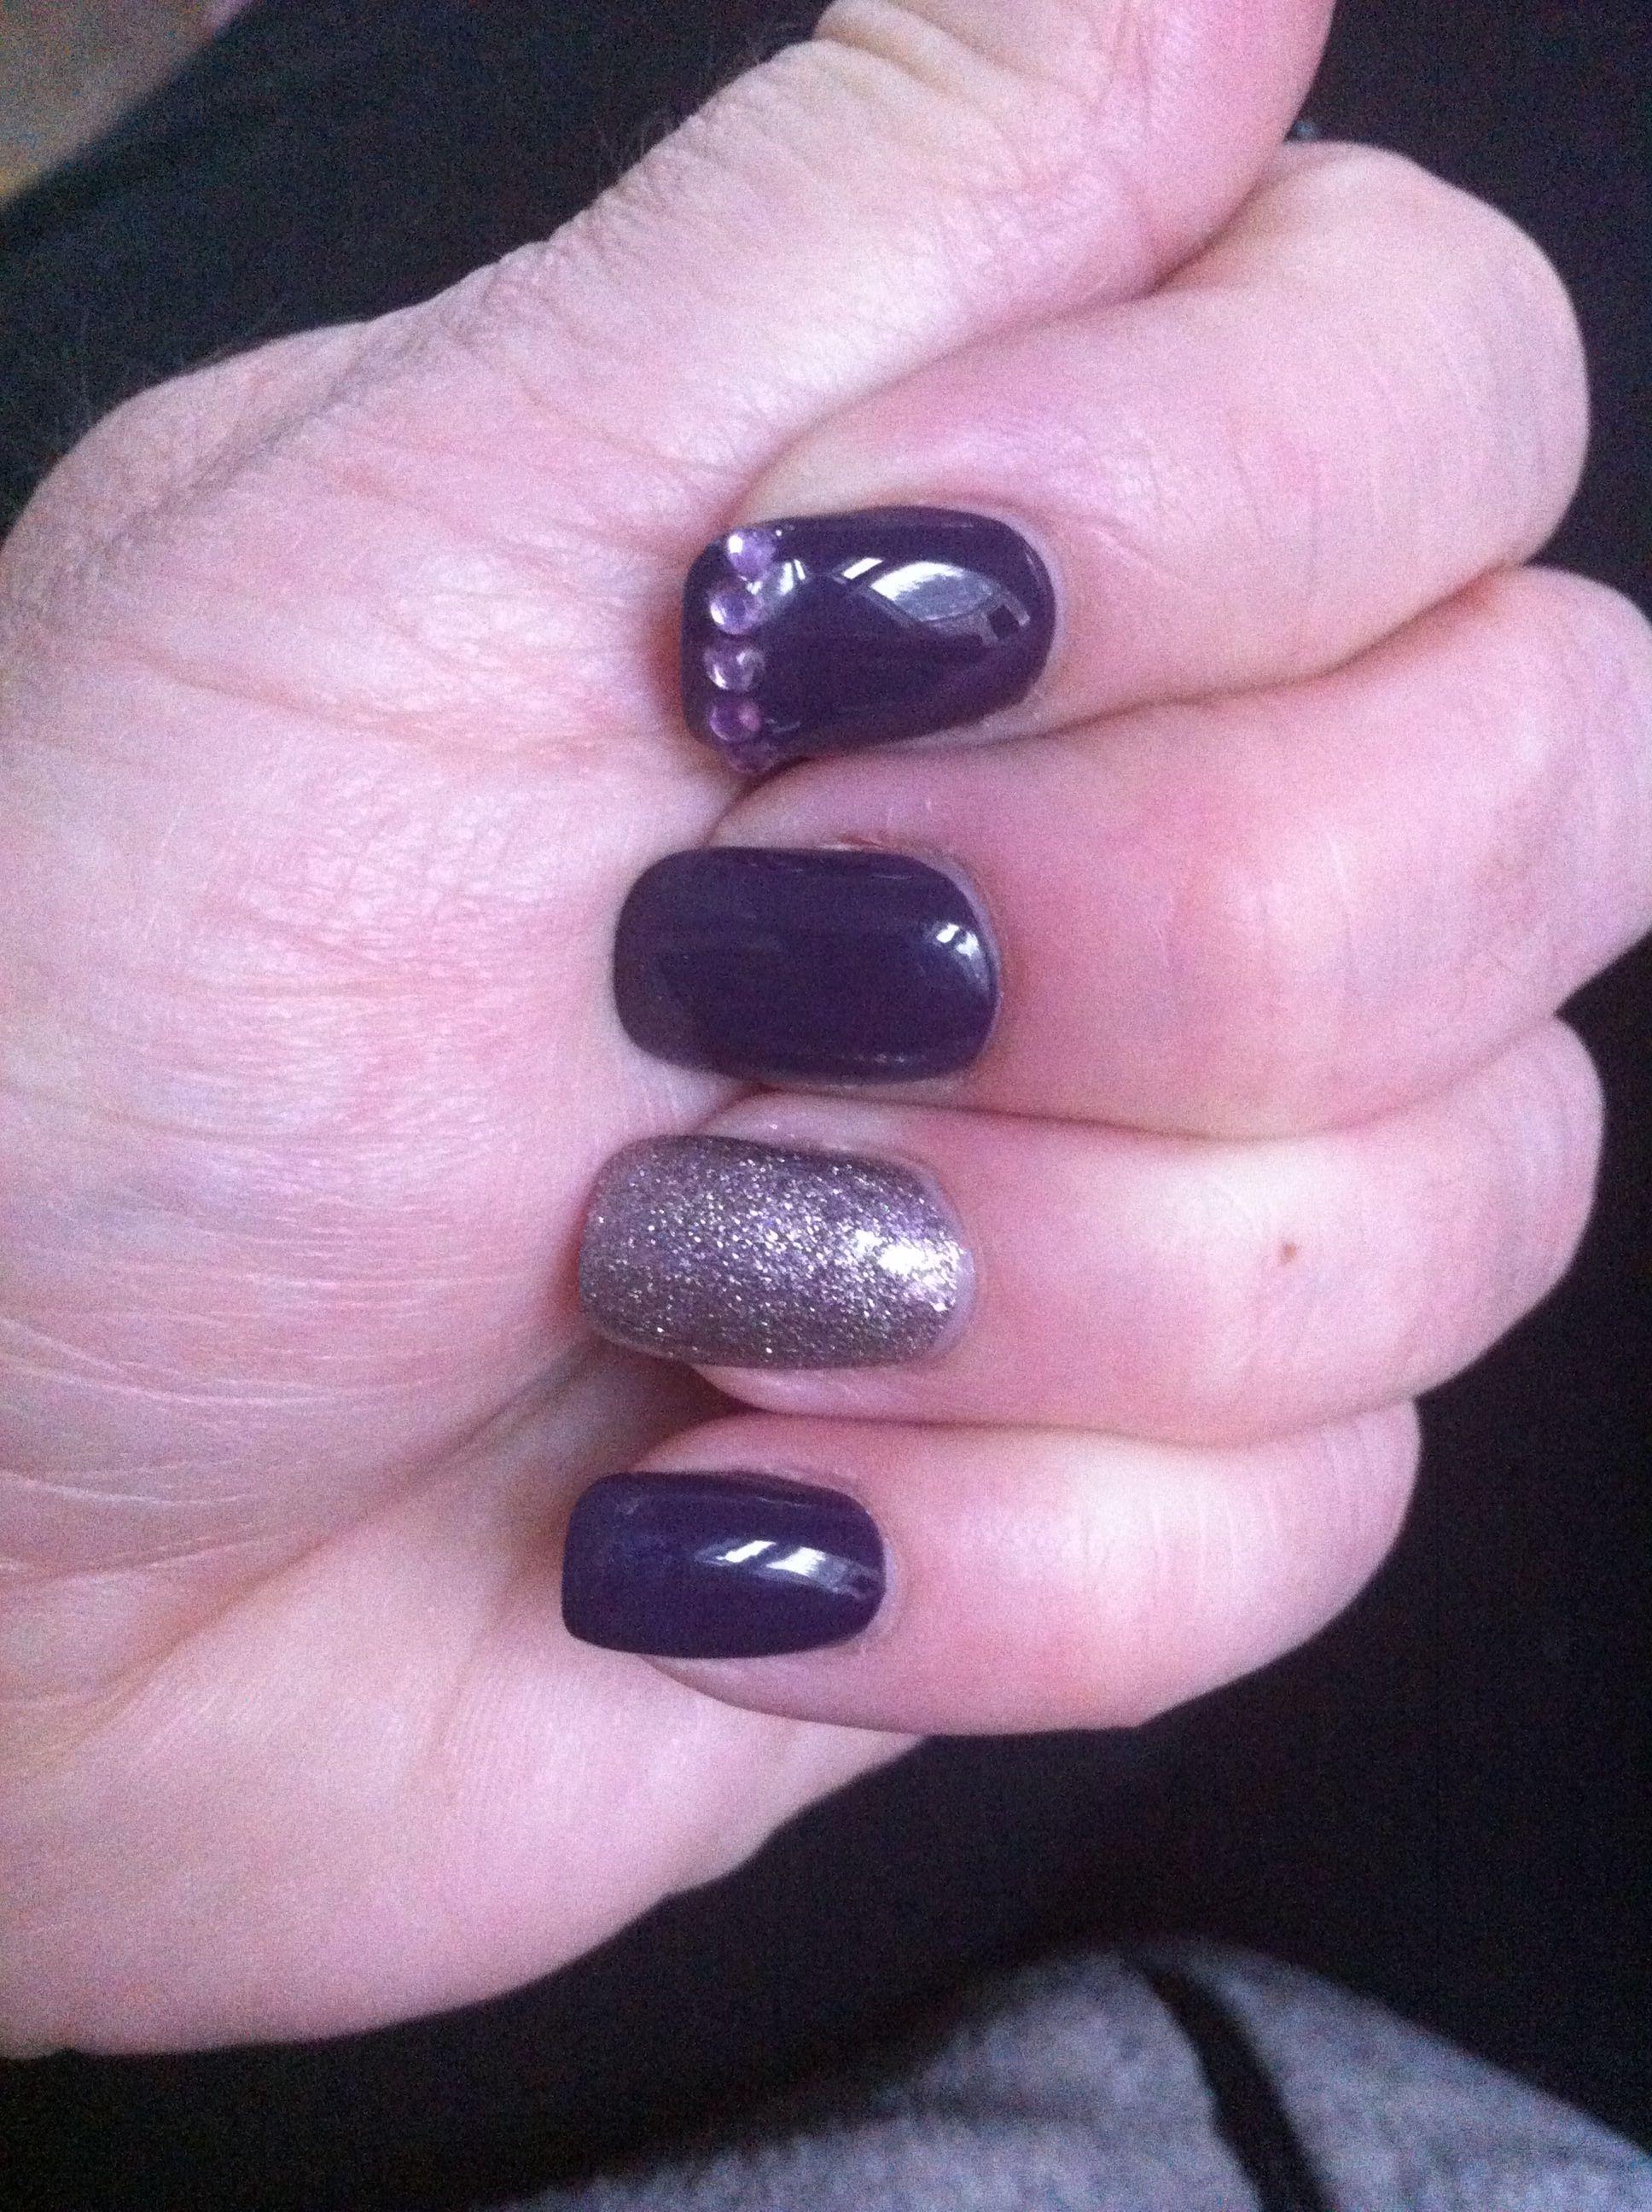 Suck nail tip